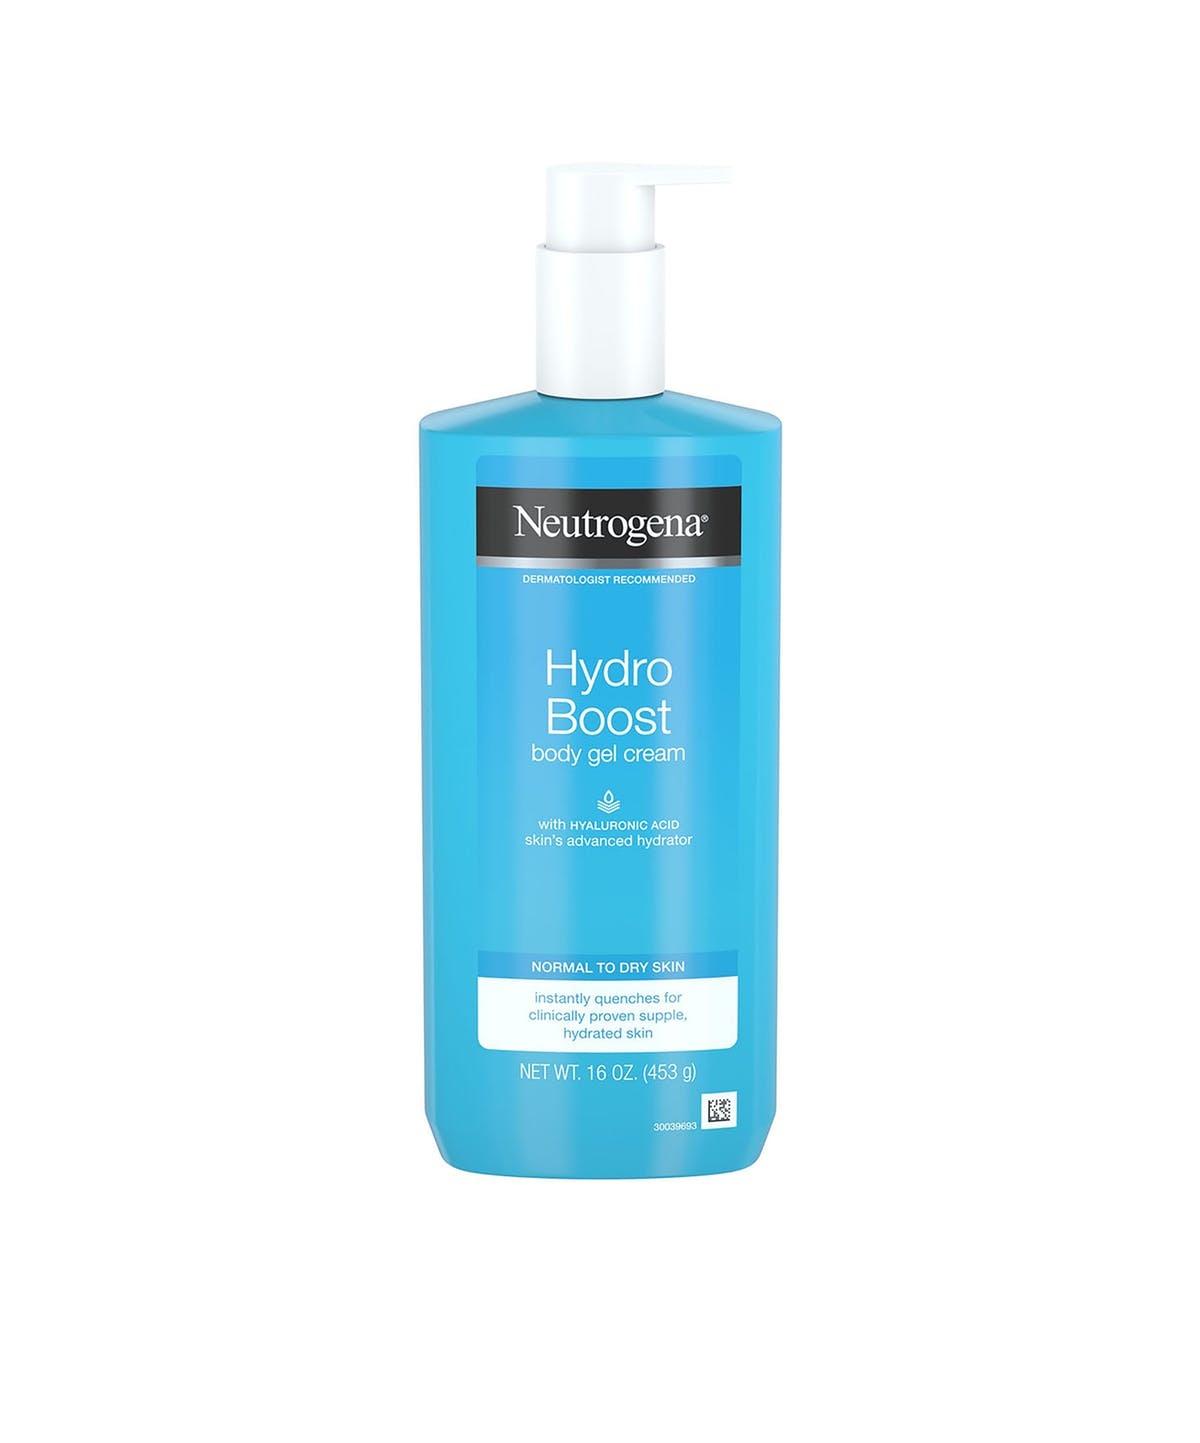 Neutrogena® Hydro Boost Body Gel Cream